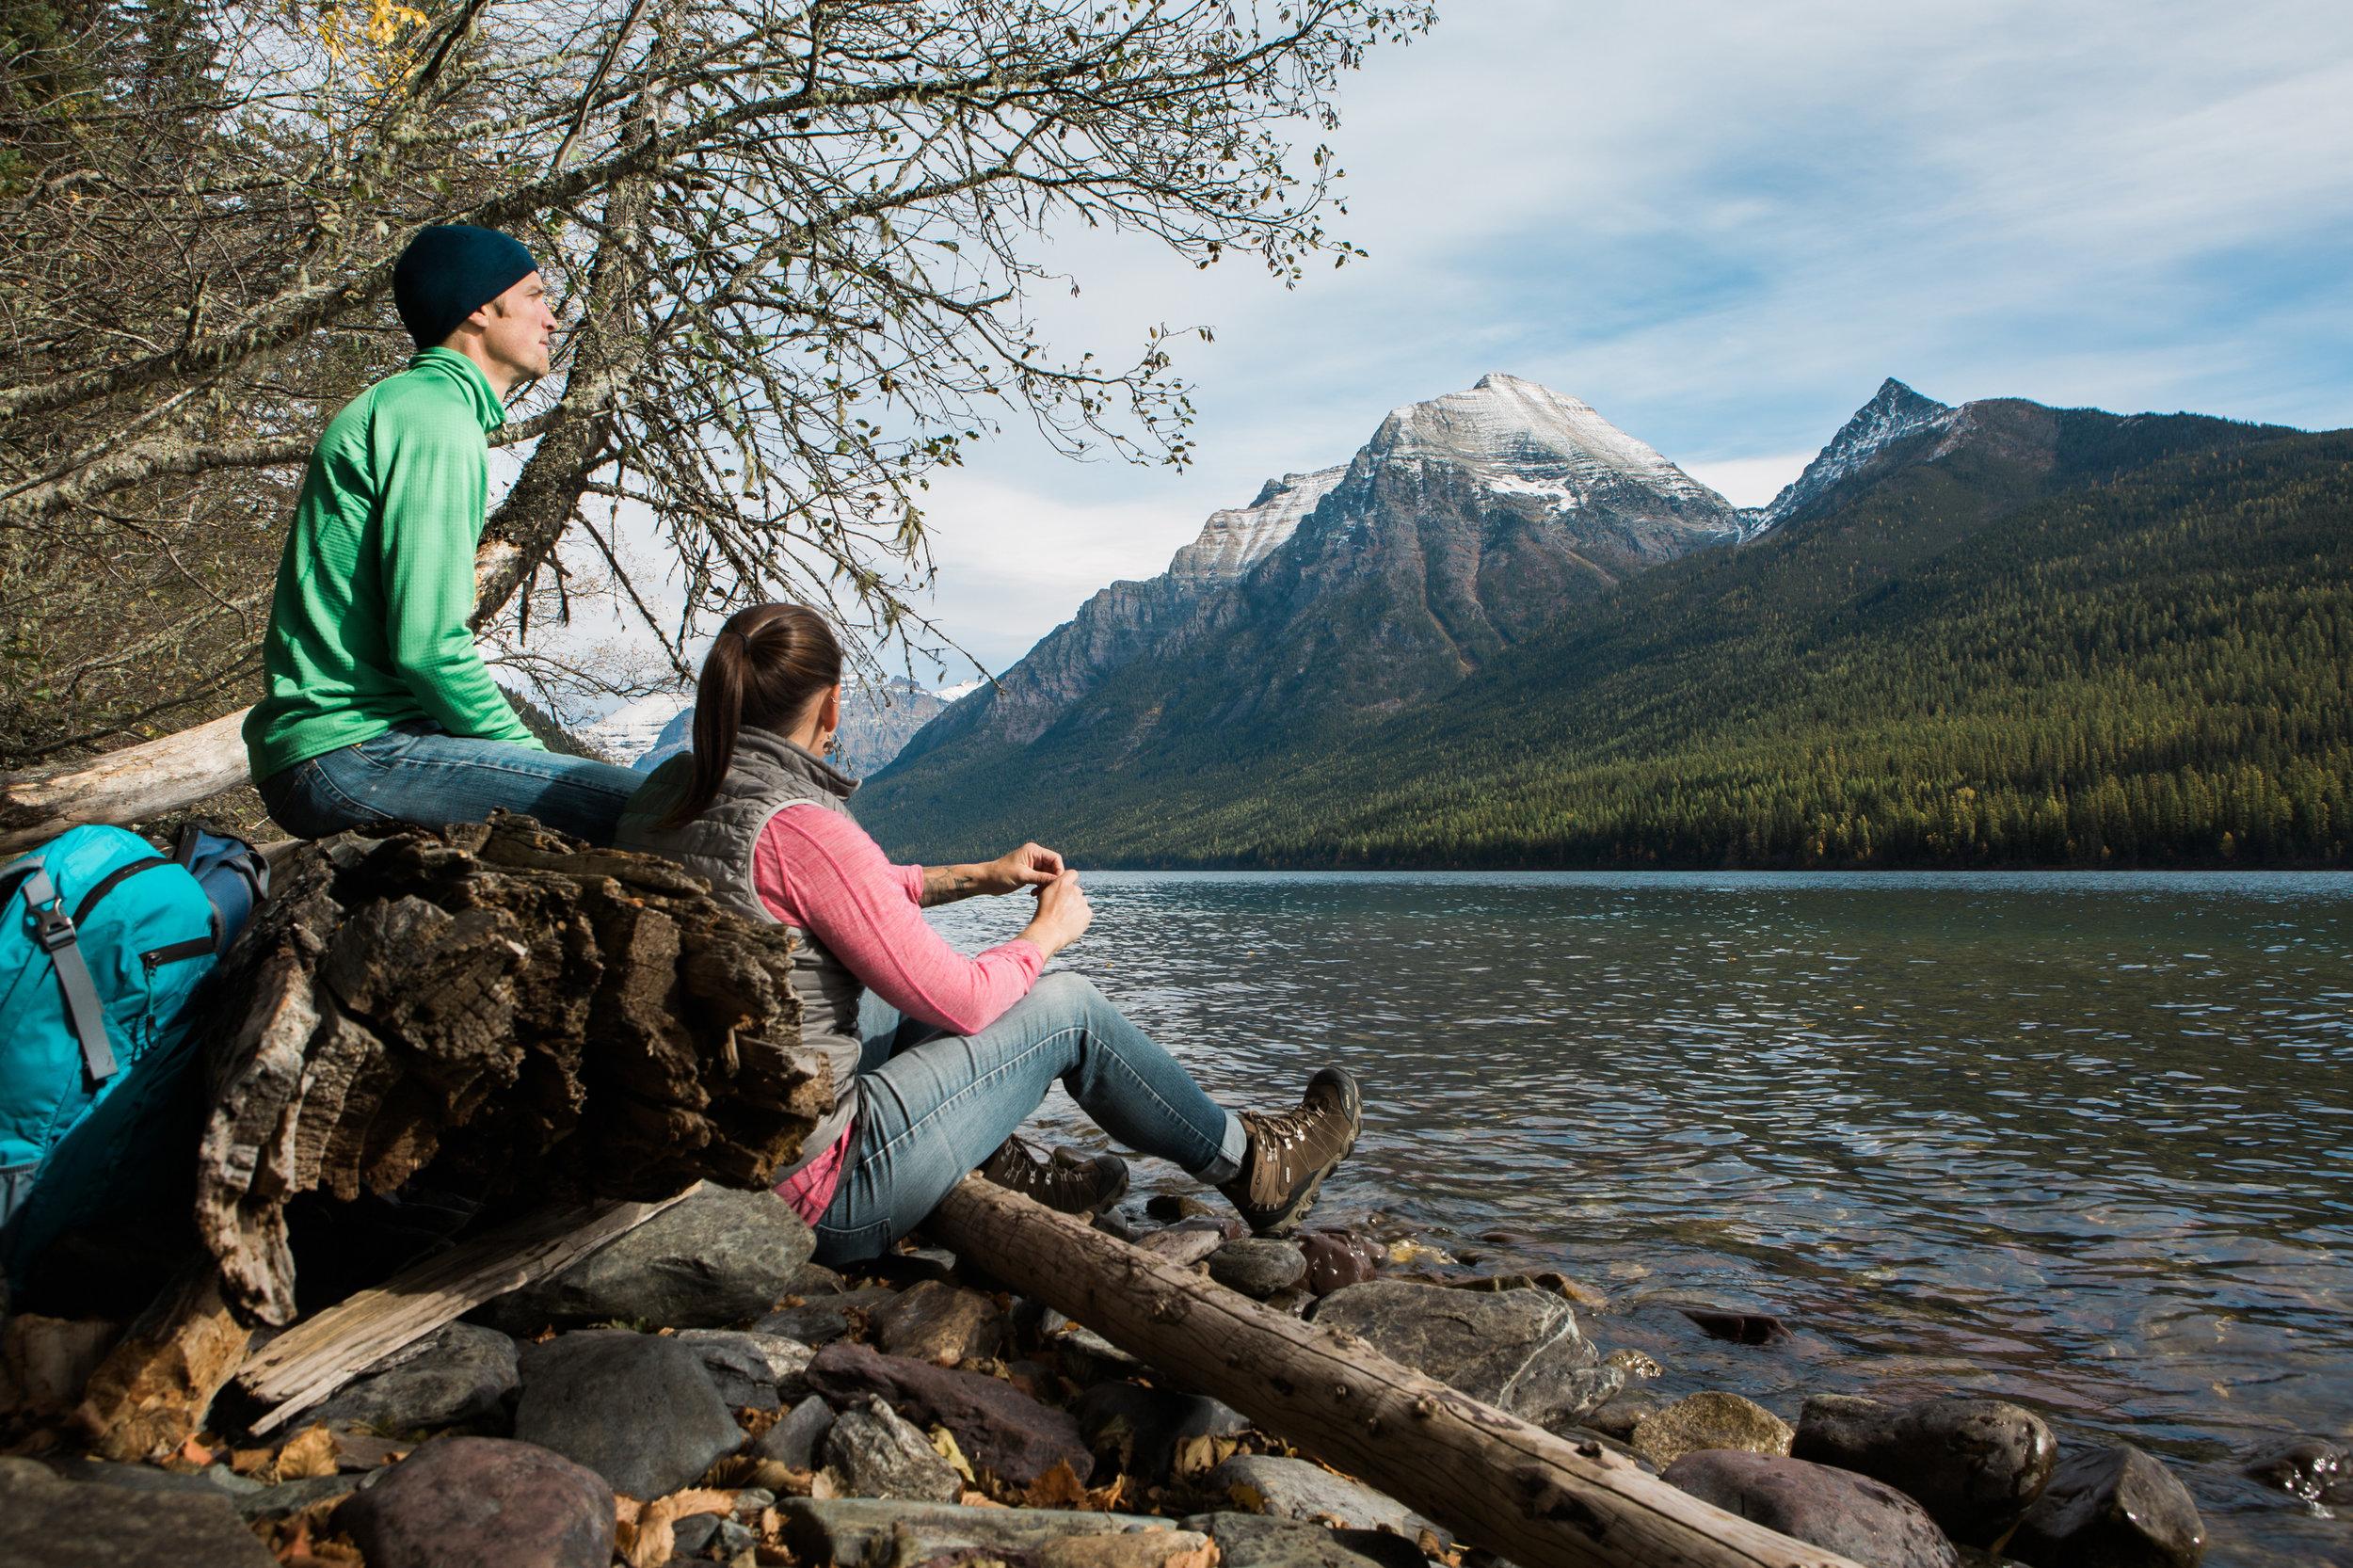 CindyGiovagnoli_Glacier_National_Park_Montana_mountains_lake_fall_autumn_road_trip-027.jpg